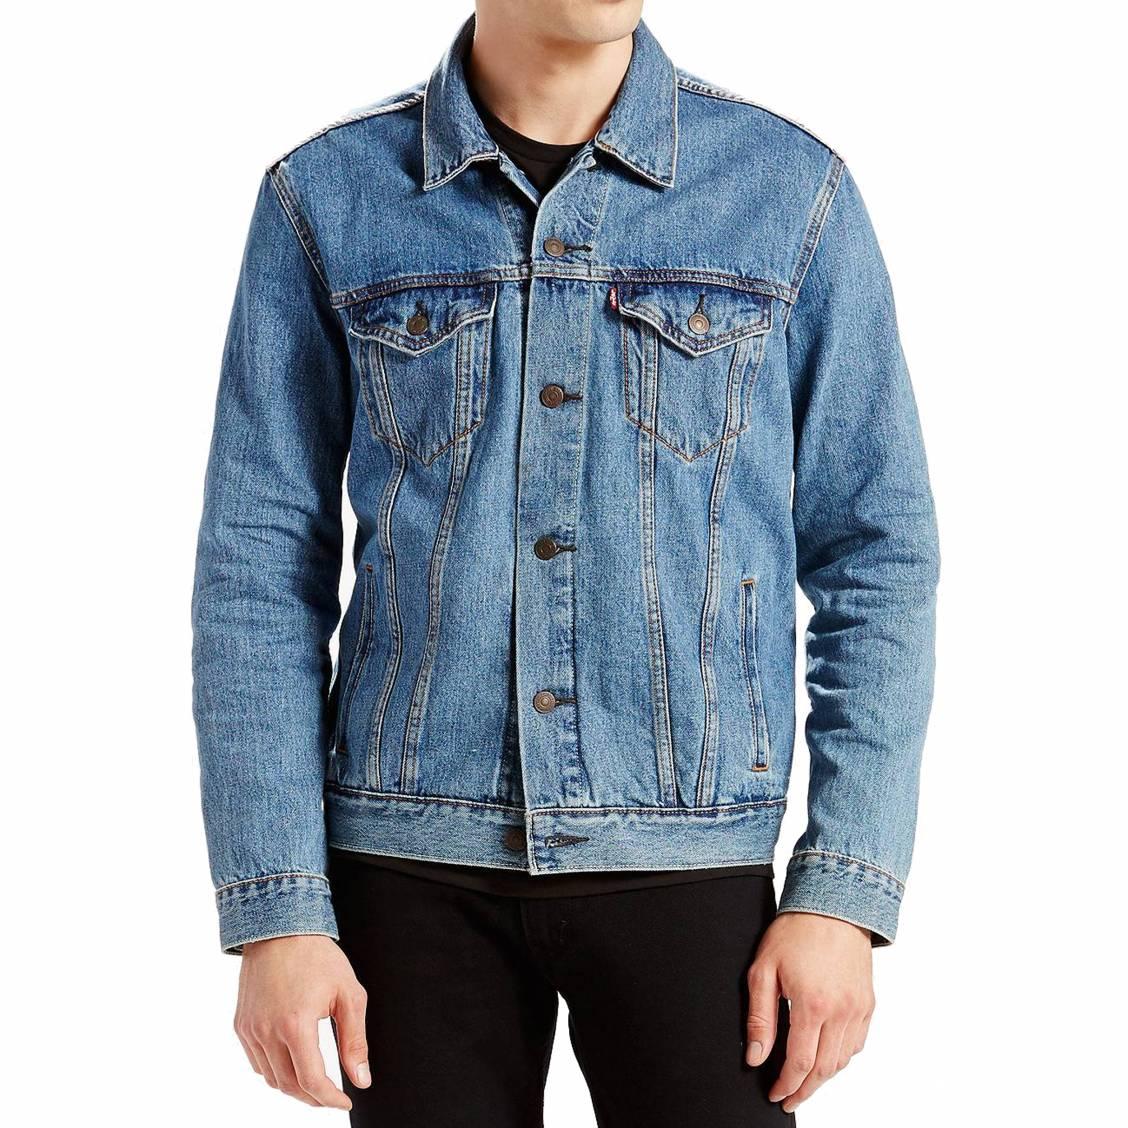 Veste en jean trucker levi\'s medium stonewash bleu clair vintage